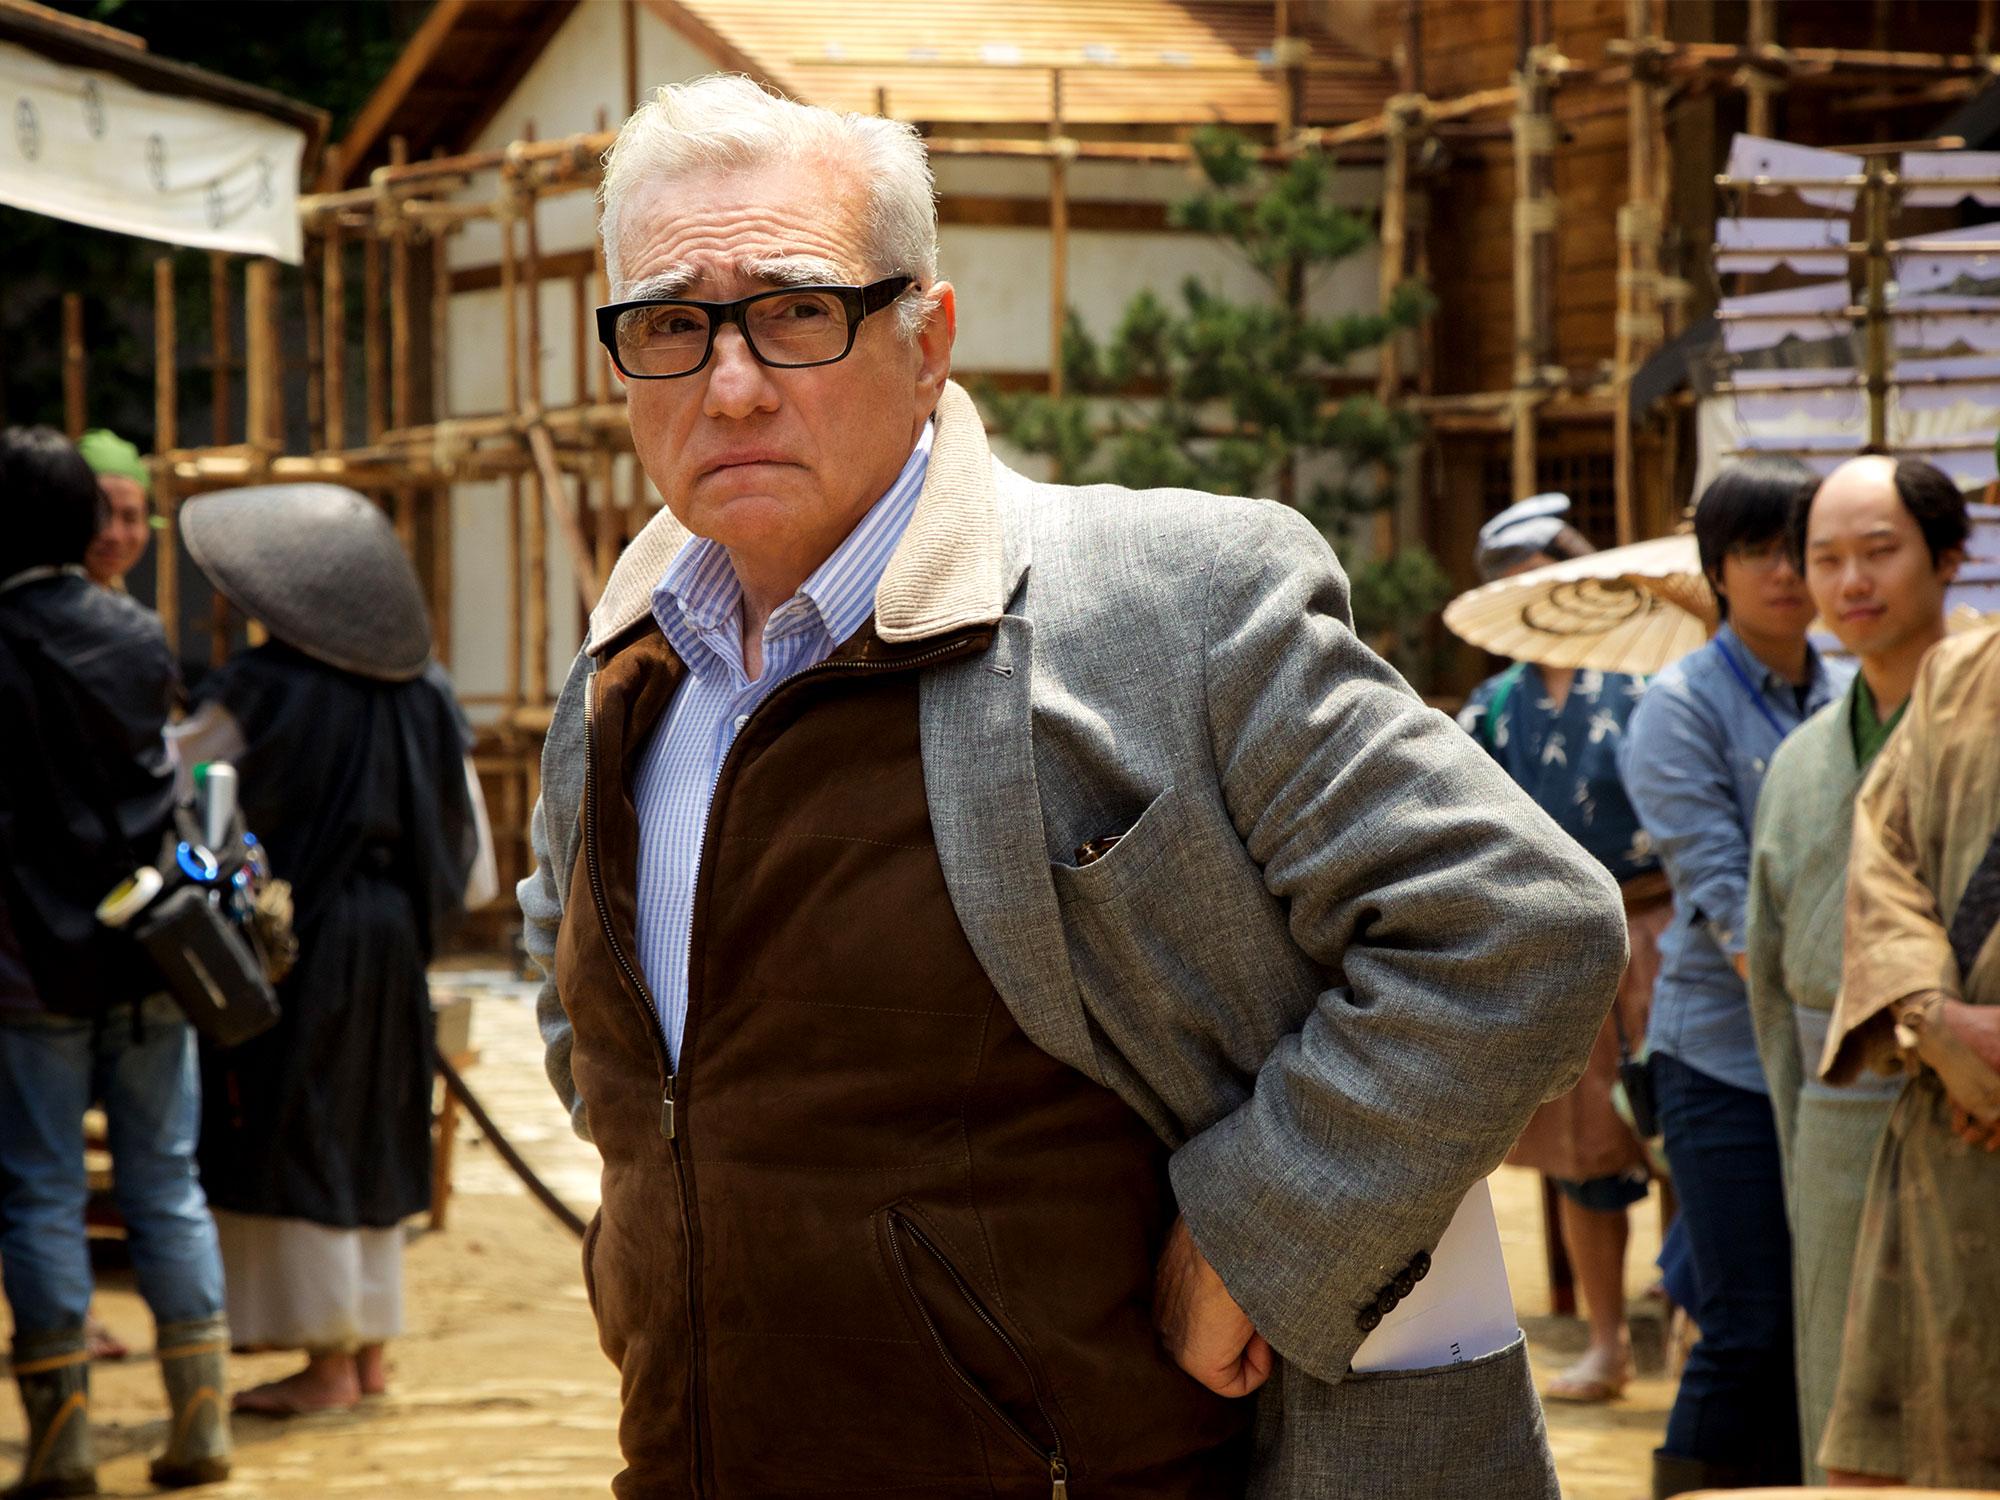 Martin Scorsese on the set of Silence